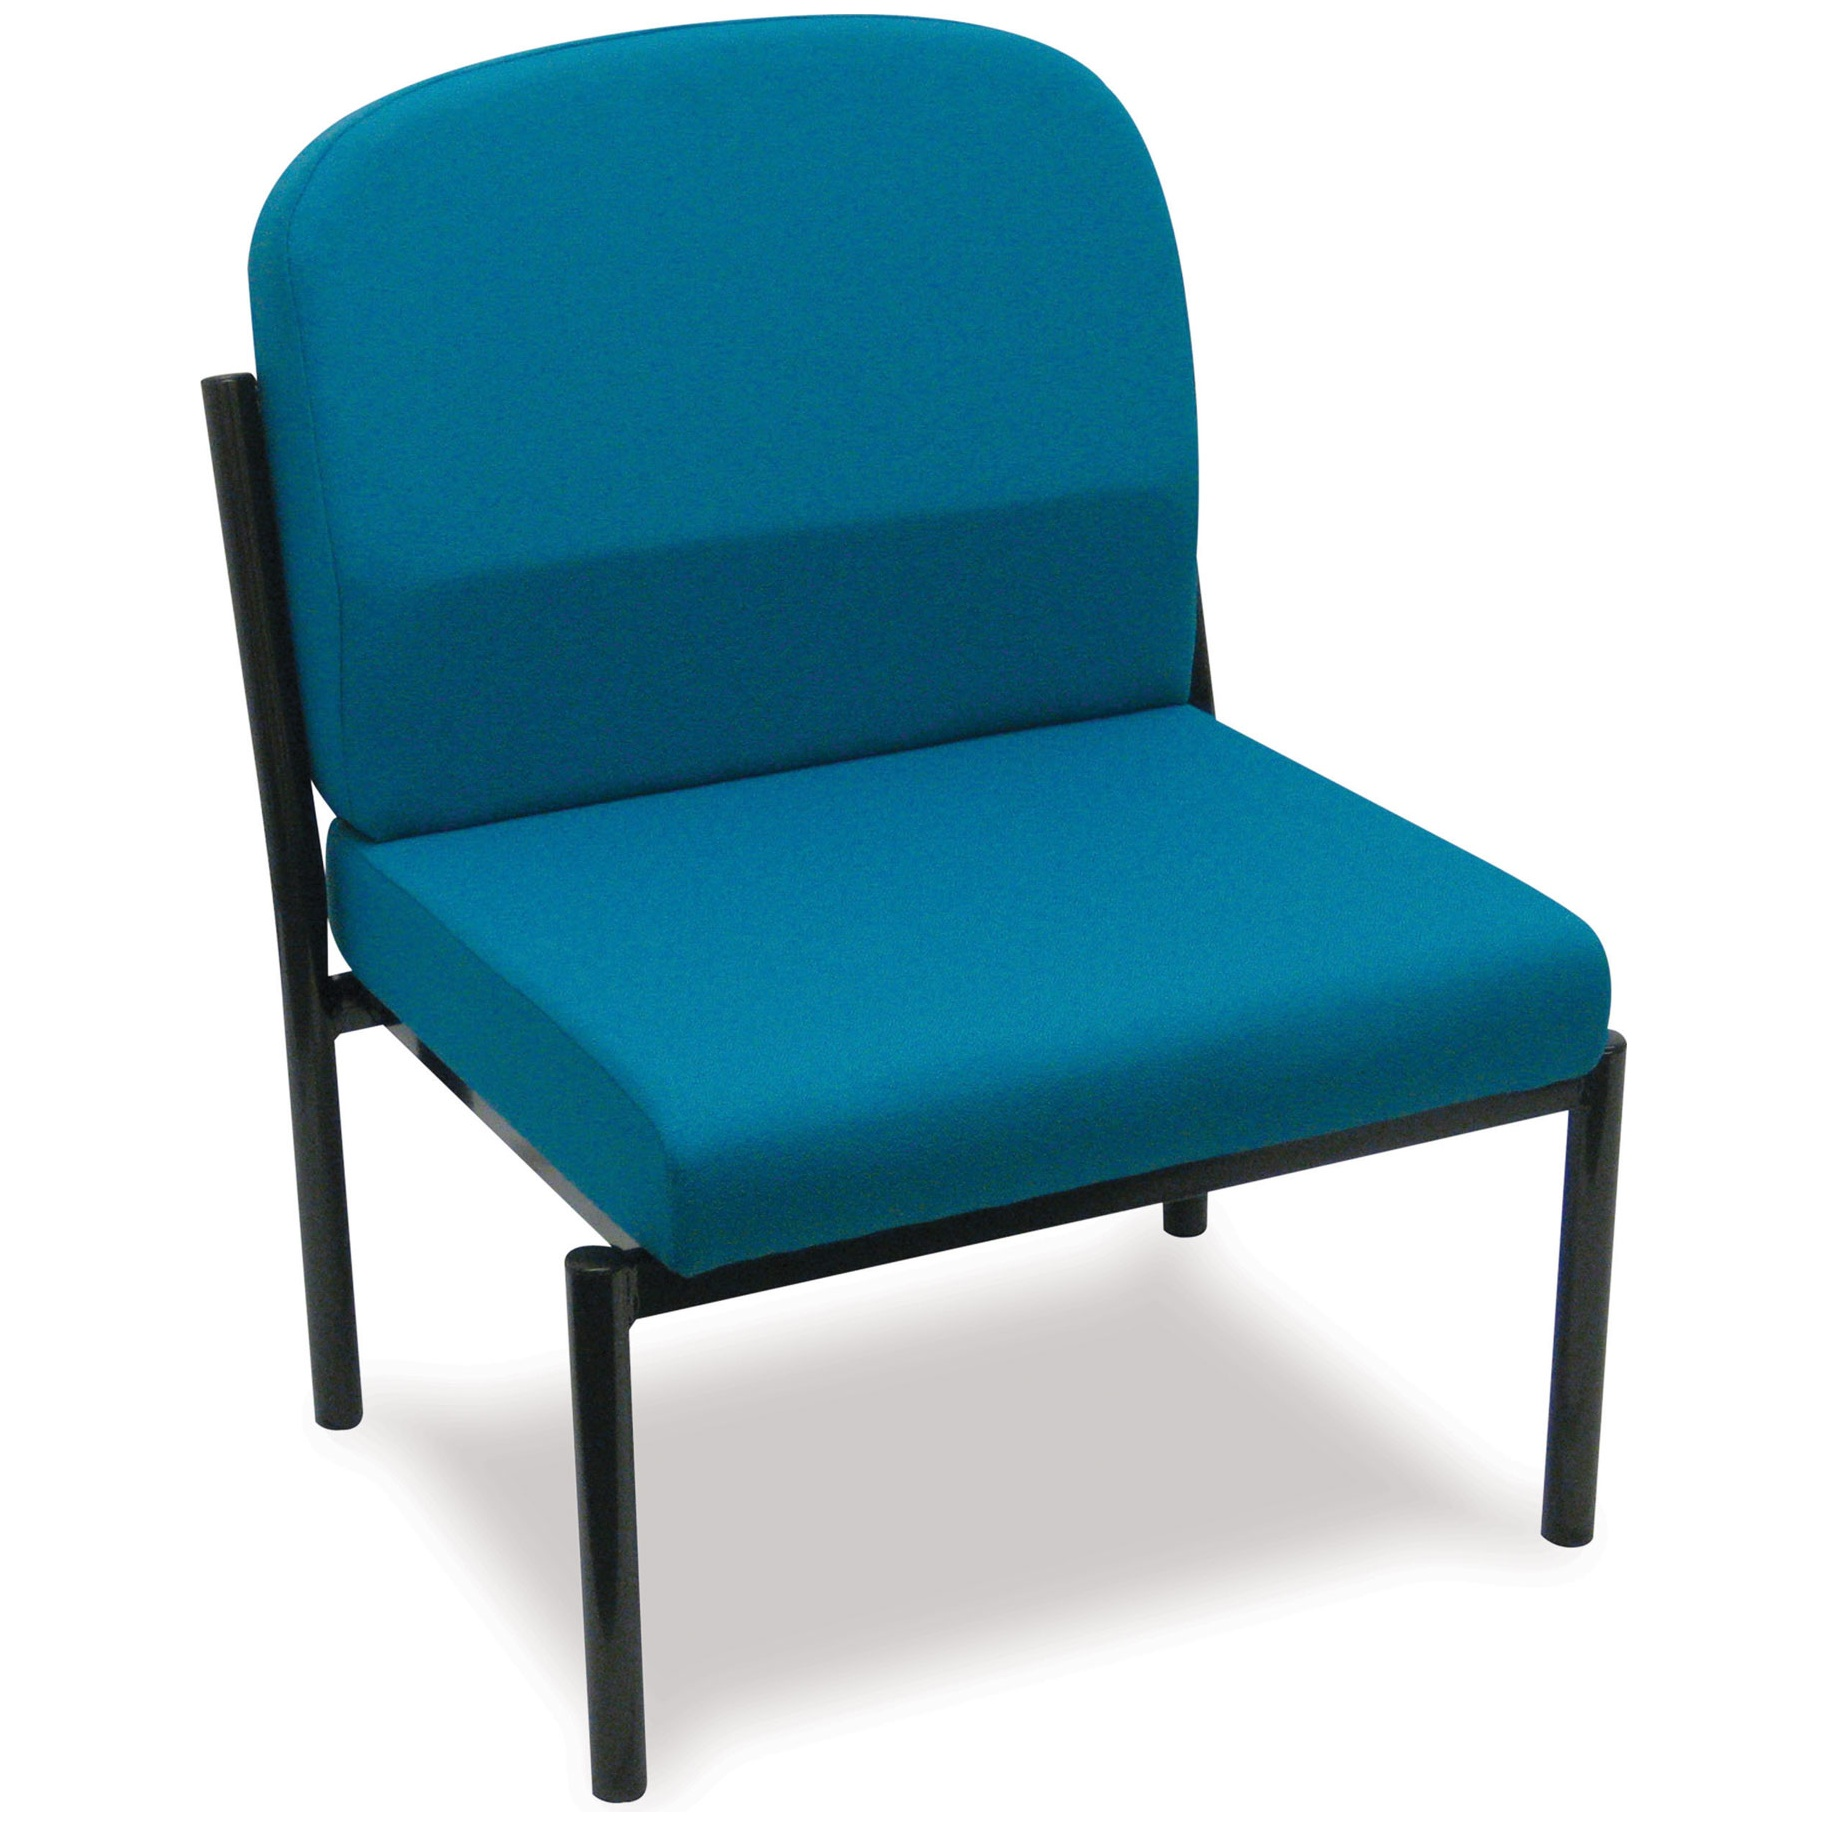 Easy Extra Heavy Duty Reception Chair